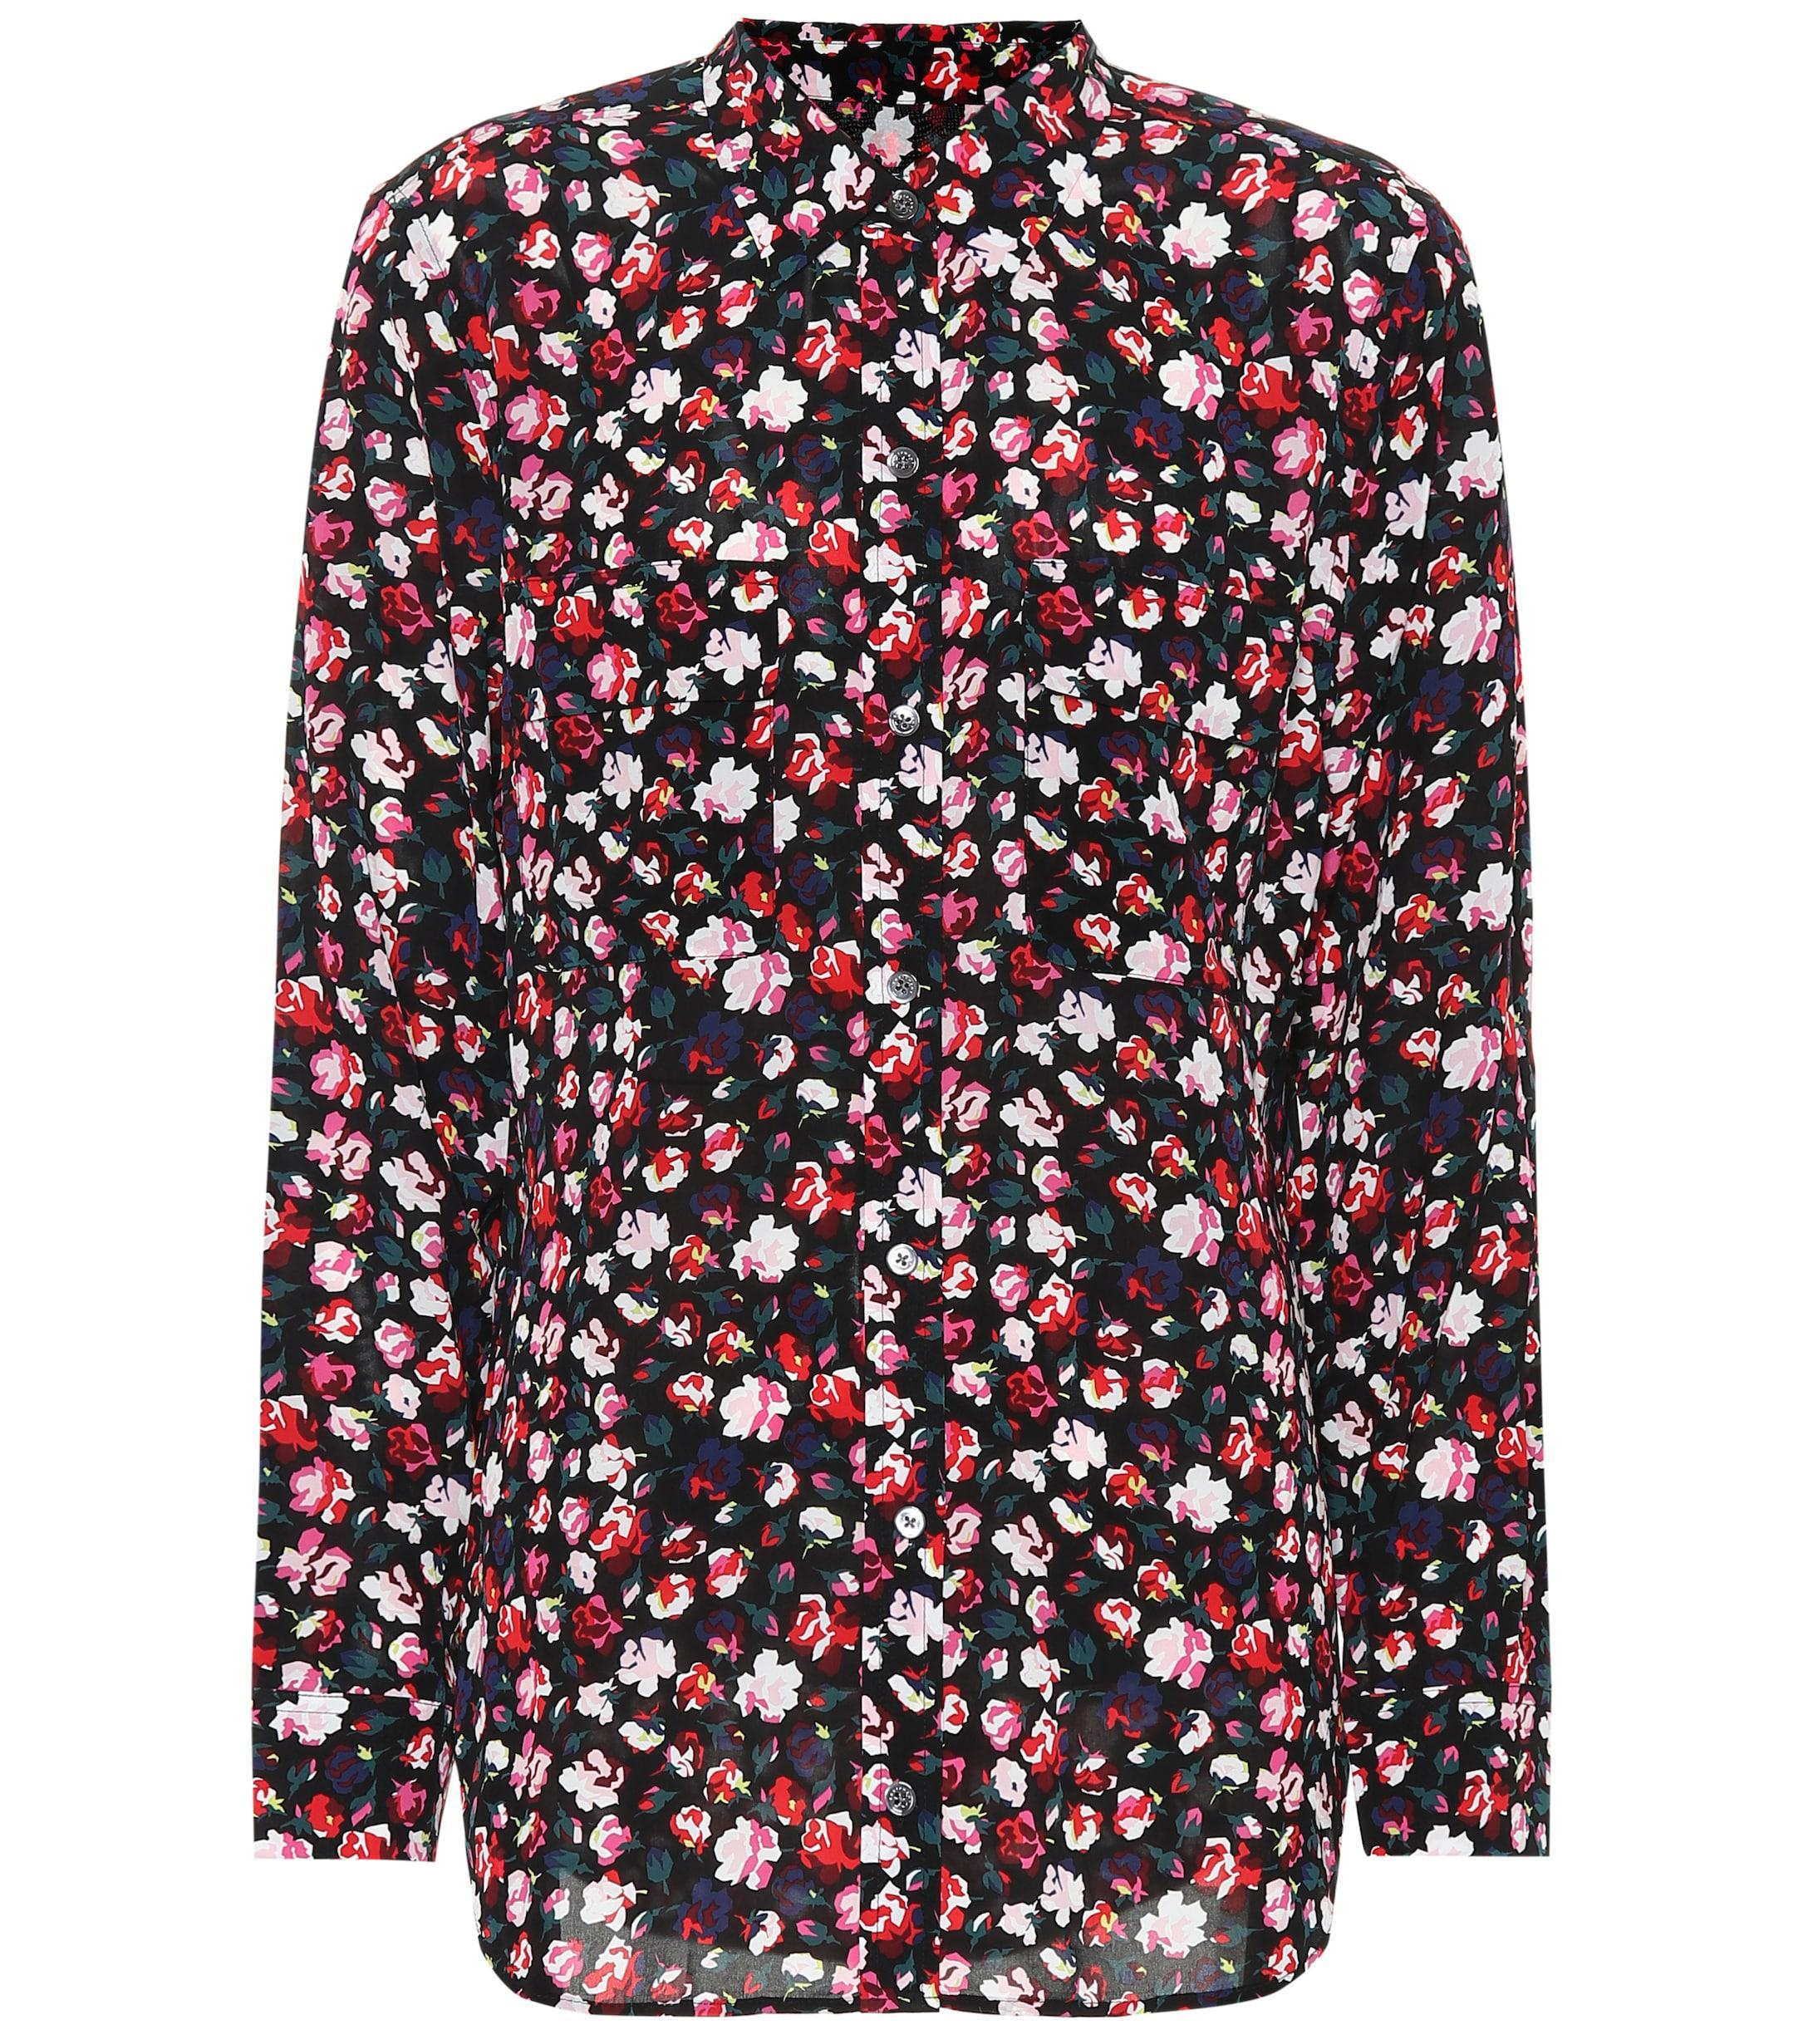 fbafef0a2827f Lyst - Equipment Floral Crêpe Shirt in Black - Save 48%